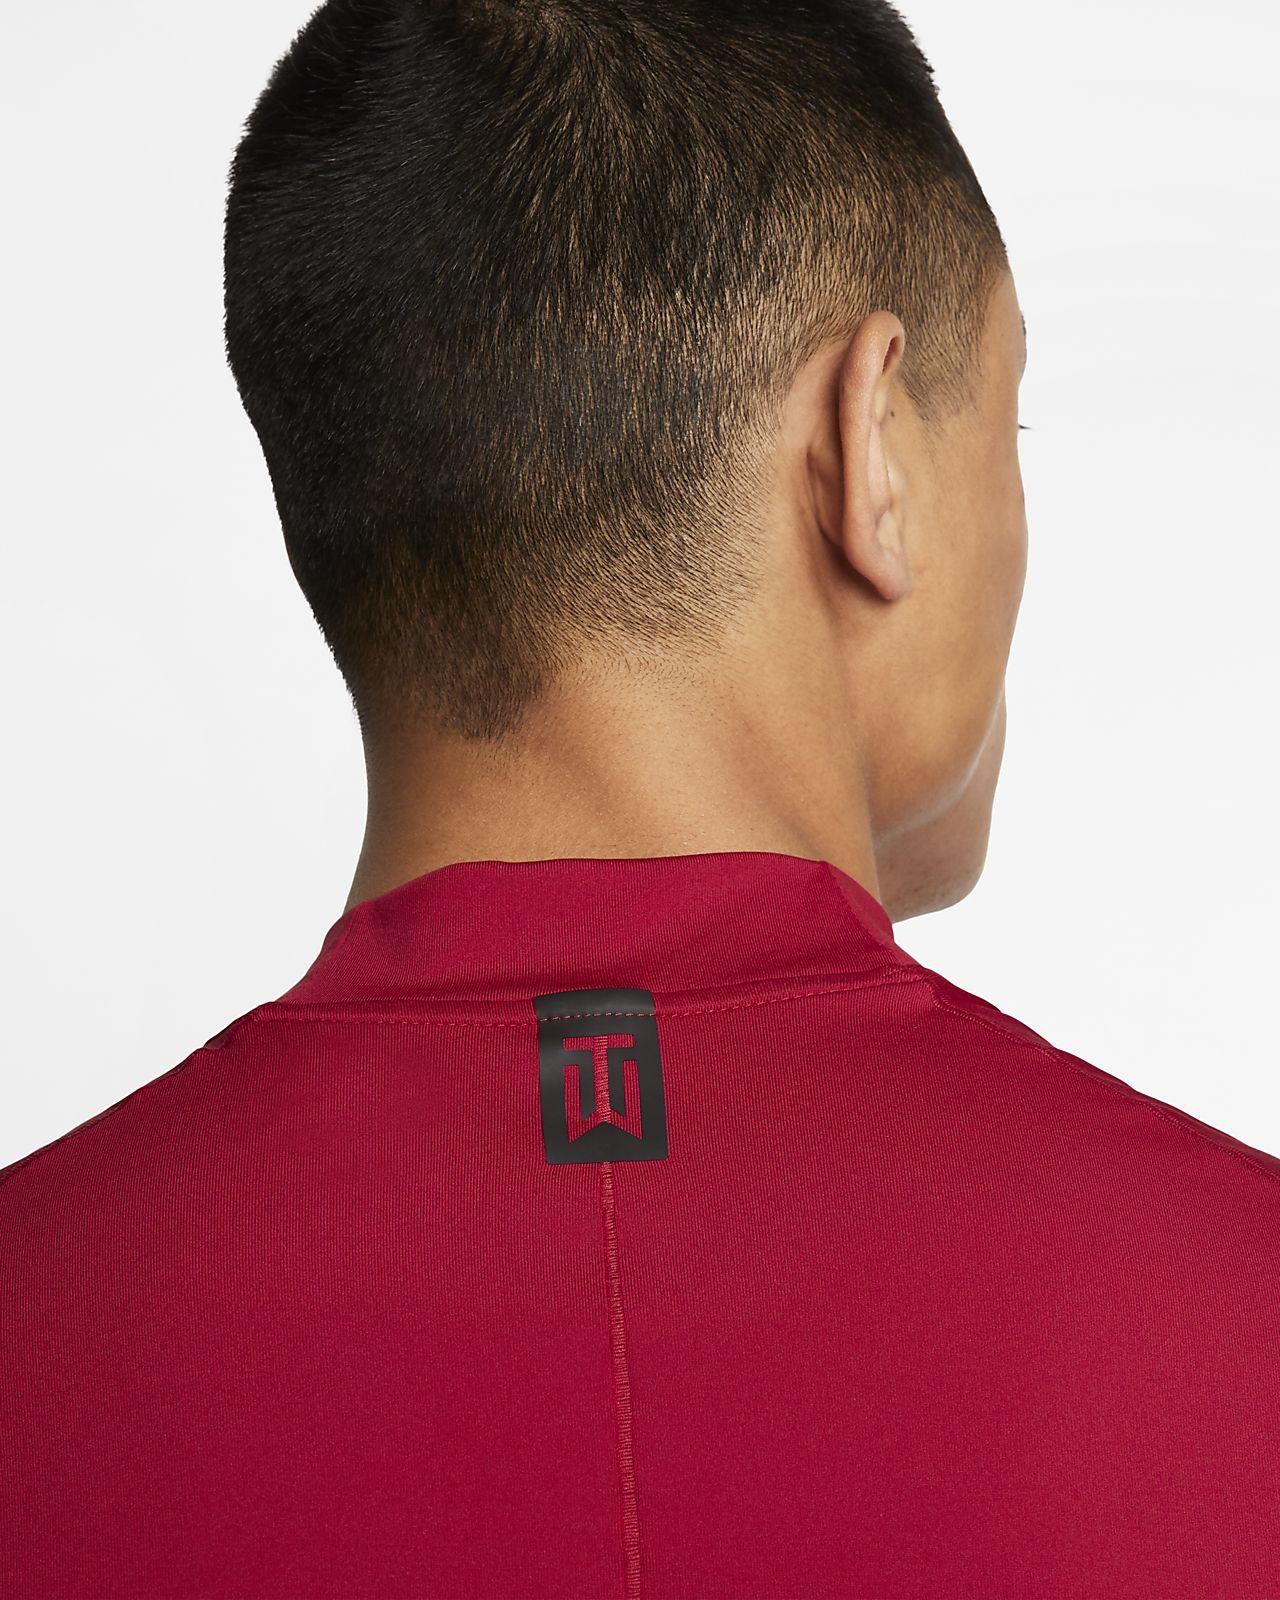 e8f011ab Nike Dri-FIT Tiger Woods Vapor Men's Mock-Neck Golf Top. Nike.com GB